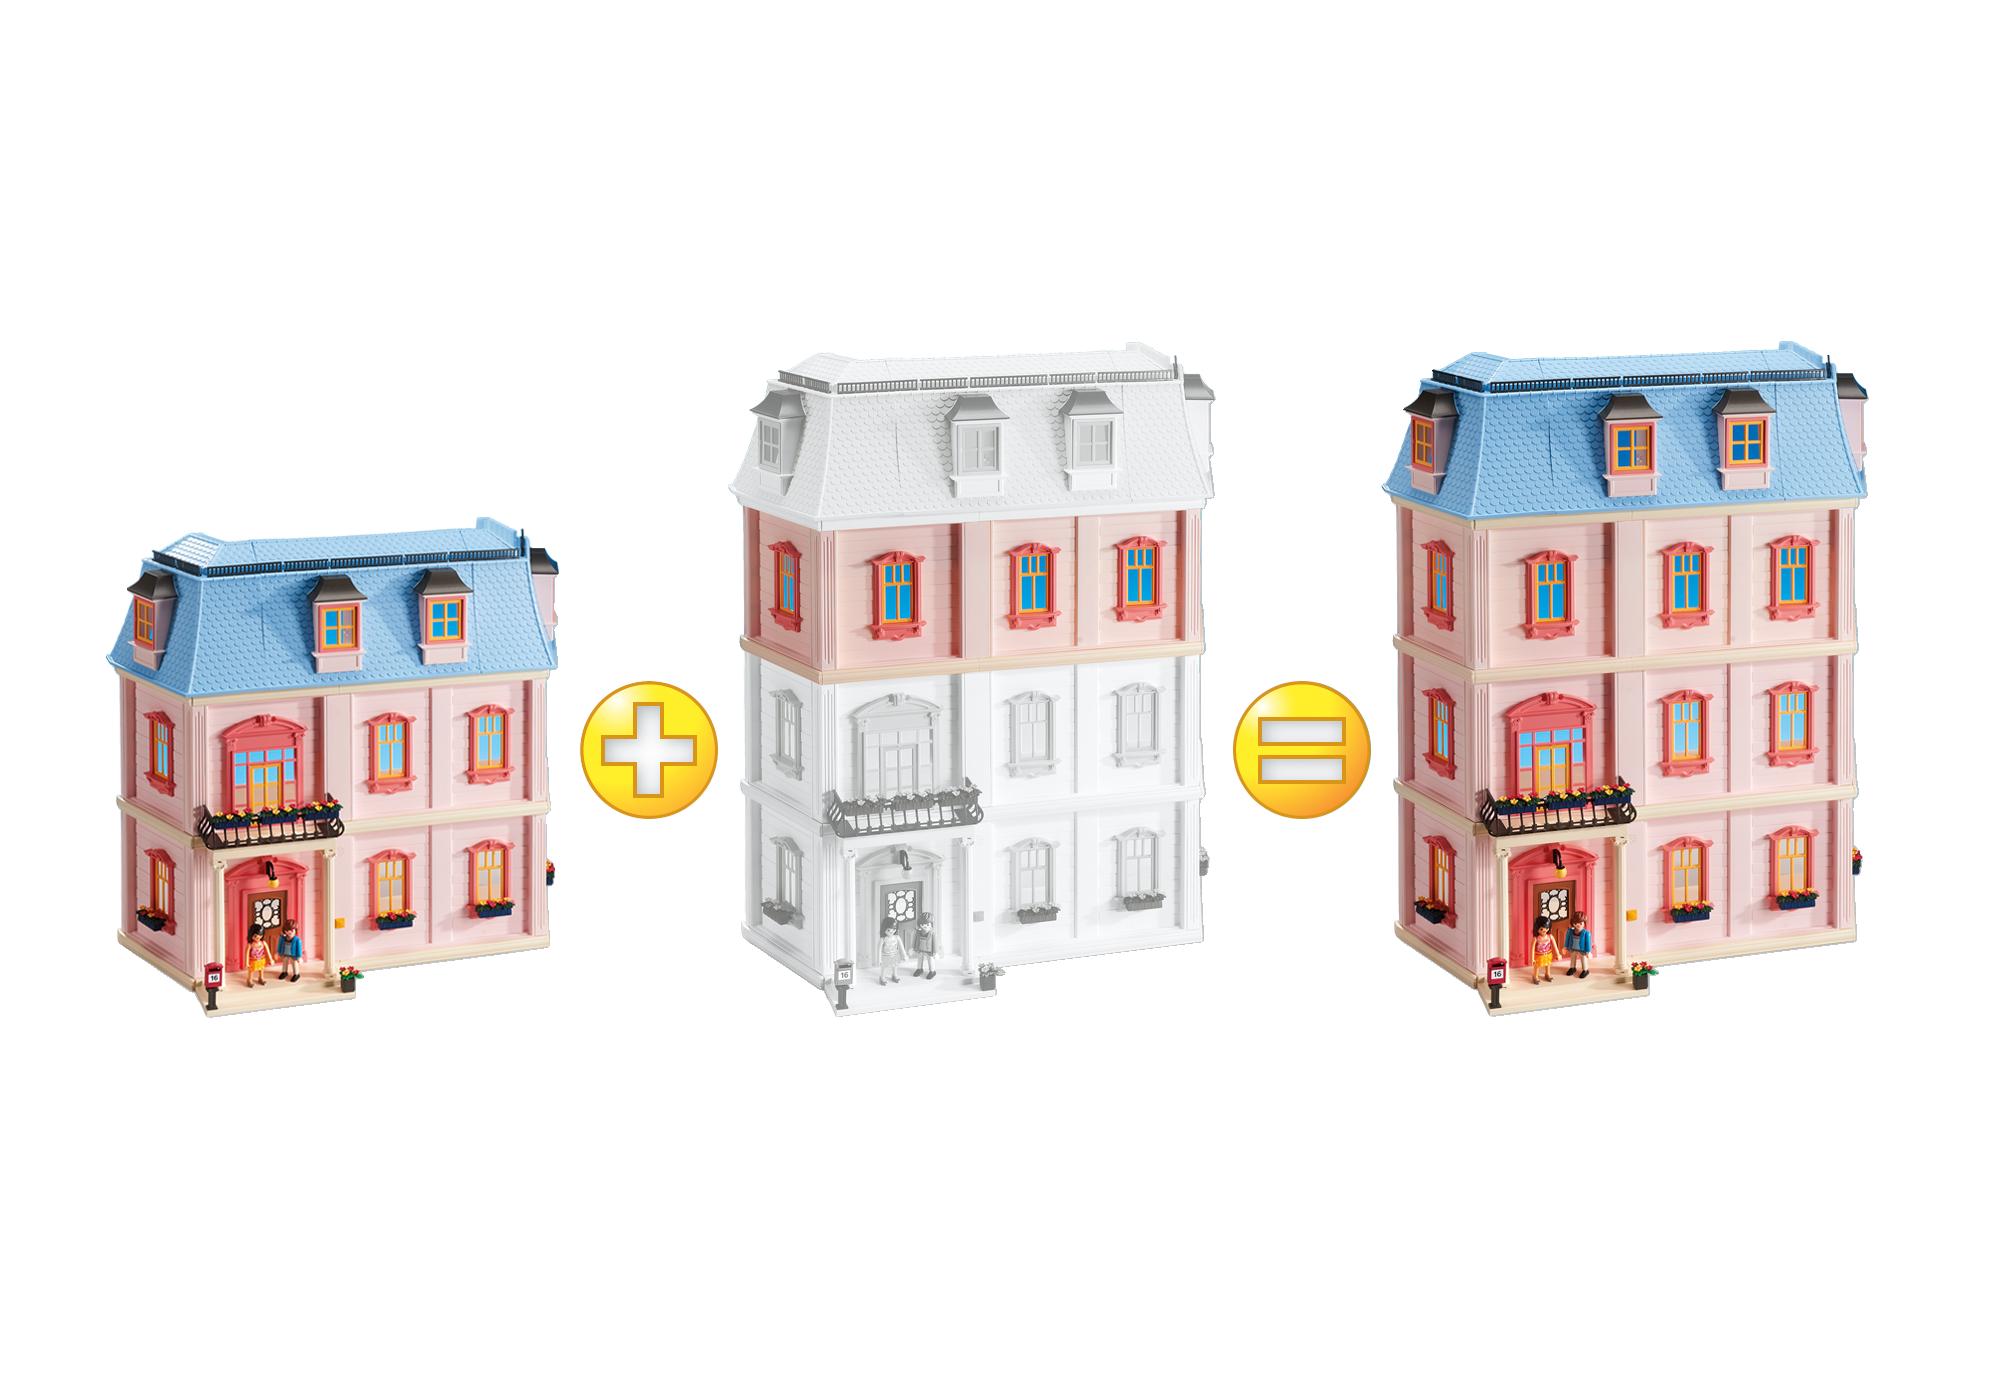 http://media.playmobil.com/i/playmobil/6453_product_extra1/Extensión B para la Casa de Muñecas Romántica (ref. 5303)